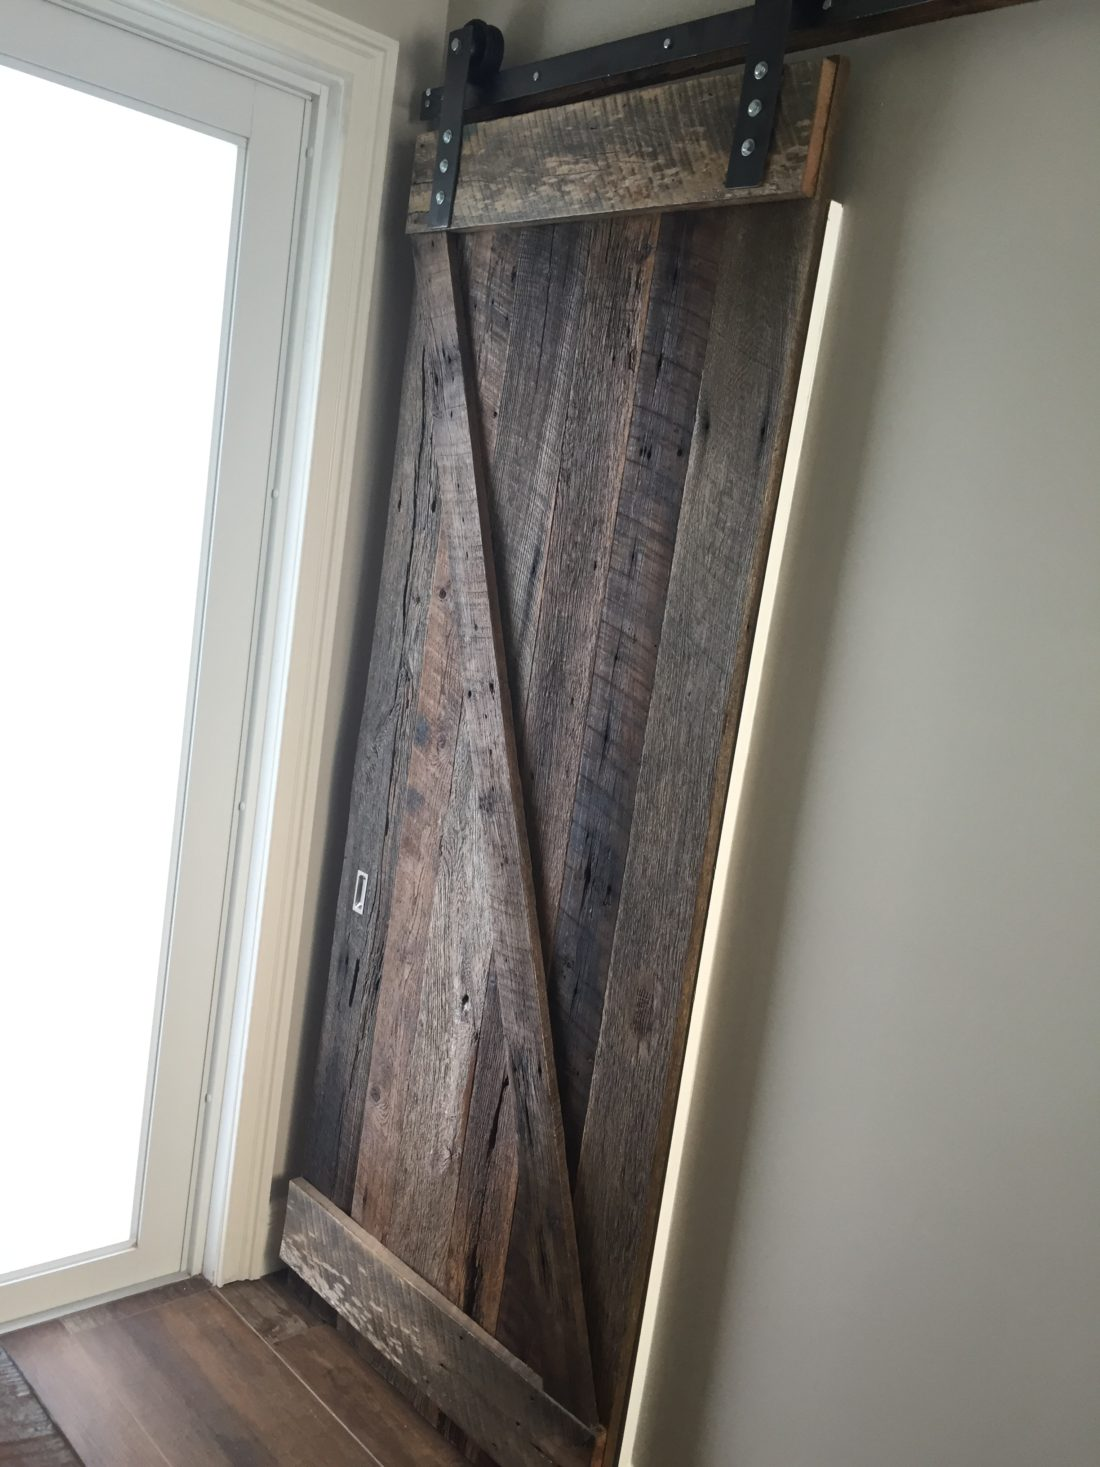 Rustic Farmhouse Furniture And Decor